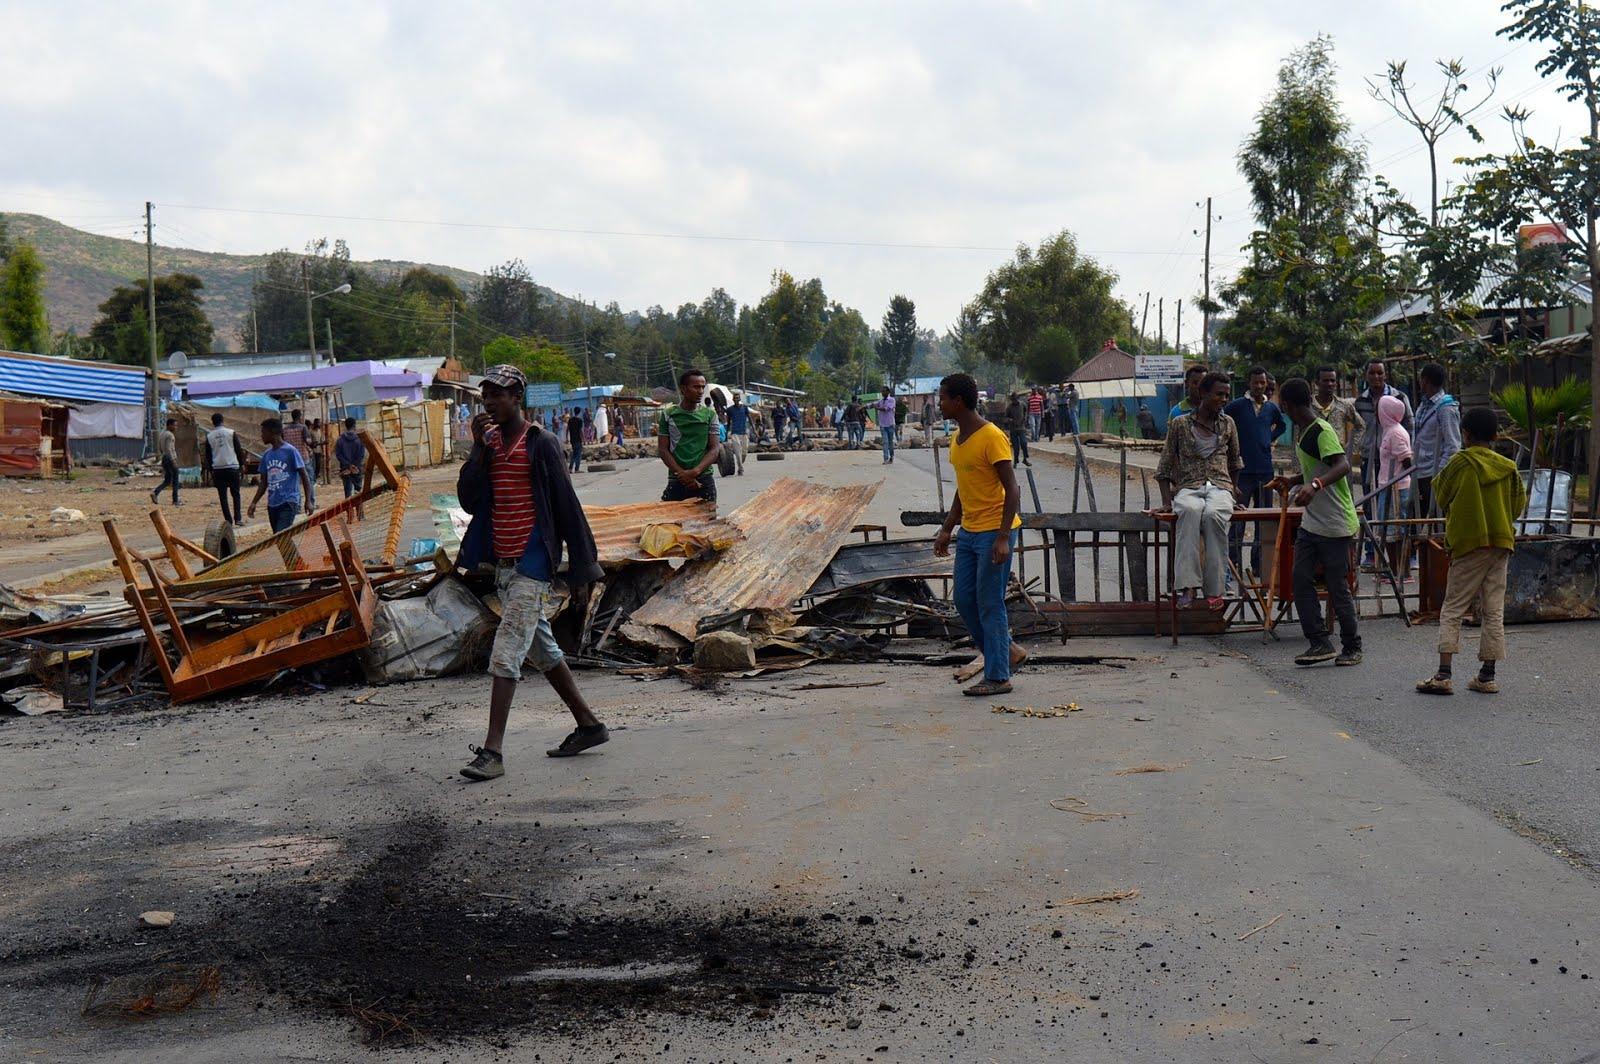 http://4.bp.blogspot.com/-djItXa_pIUA/Vo2s4qPaoyI/AAAAAAAAO8E/Mq7oZoHam6o/s1600/oromo-protest-road-blocking.jpg